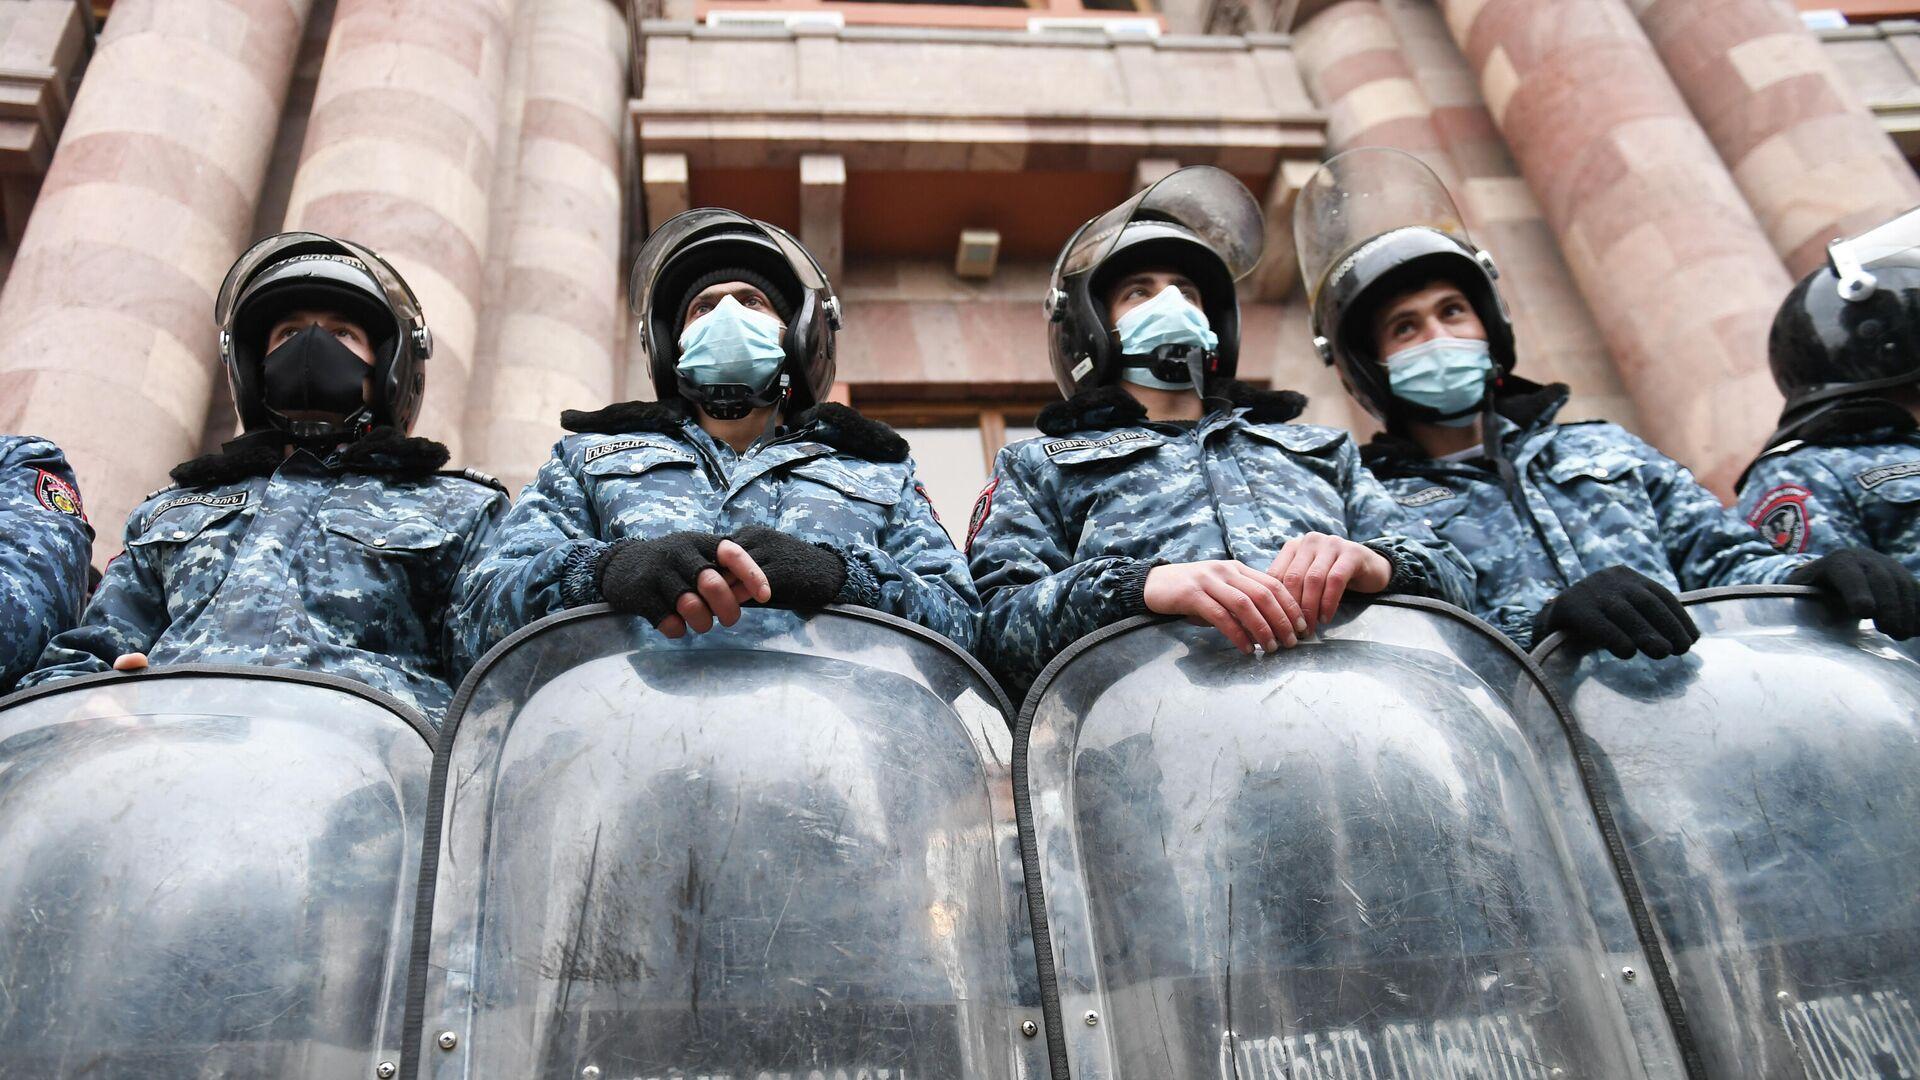 Сотрудники полиции следят за соблюдением порядка во время акции протеста в Ереване - РИА Новости, 1920, 11.12.2020